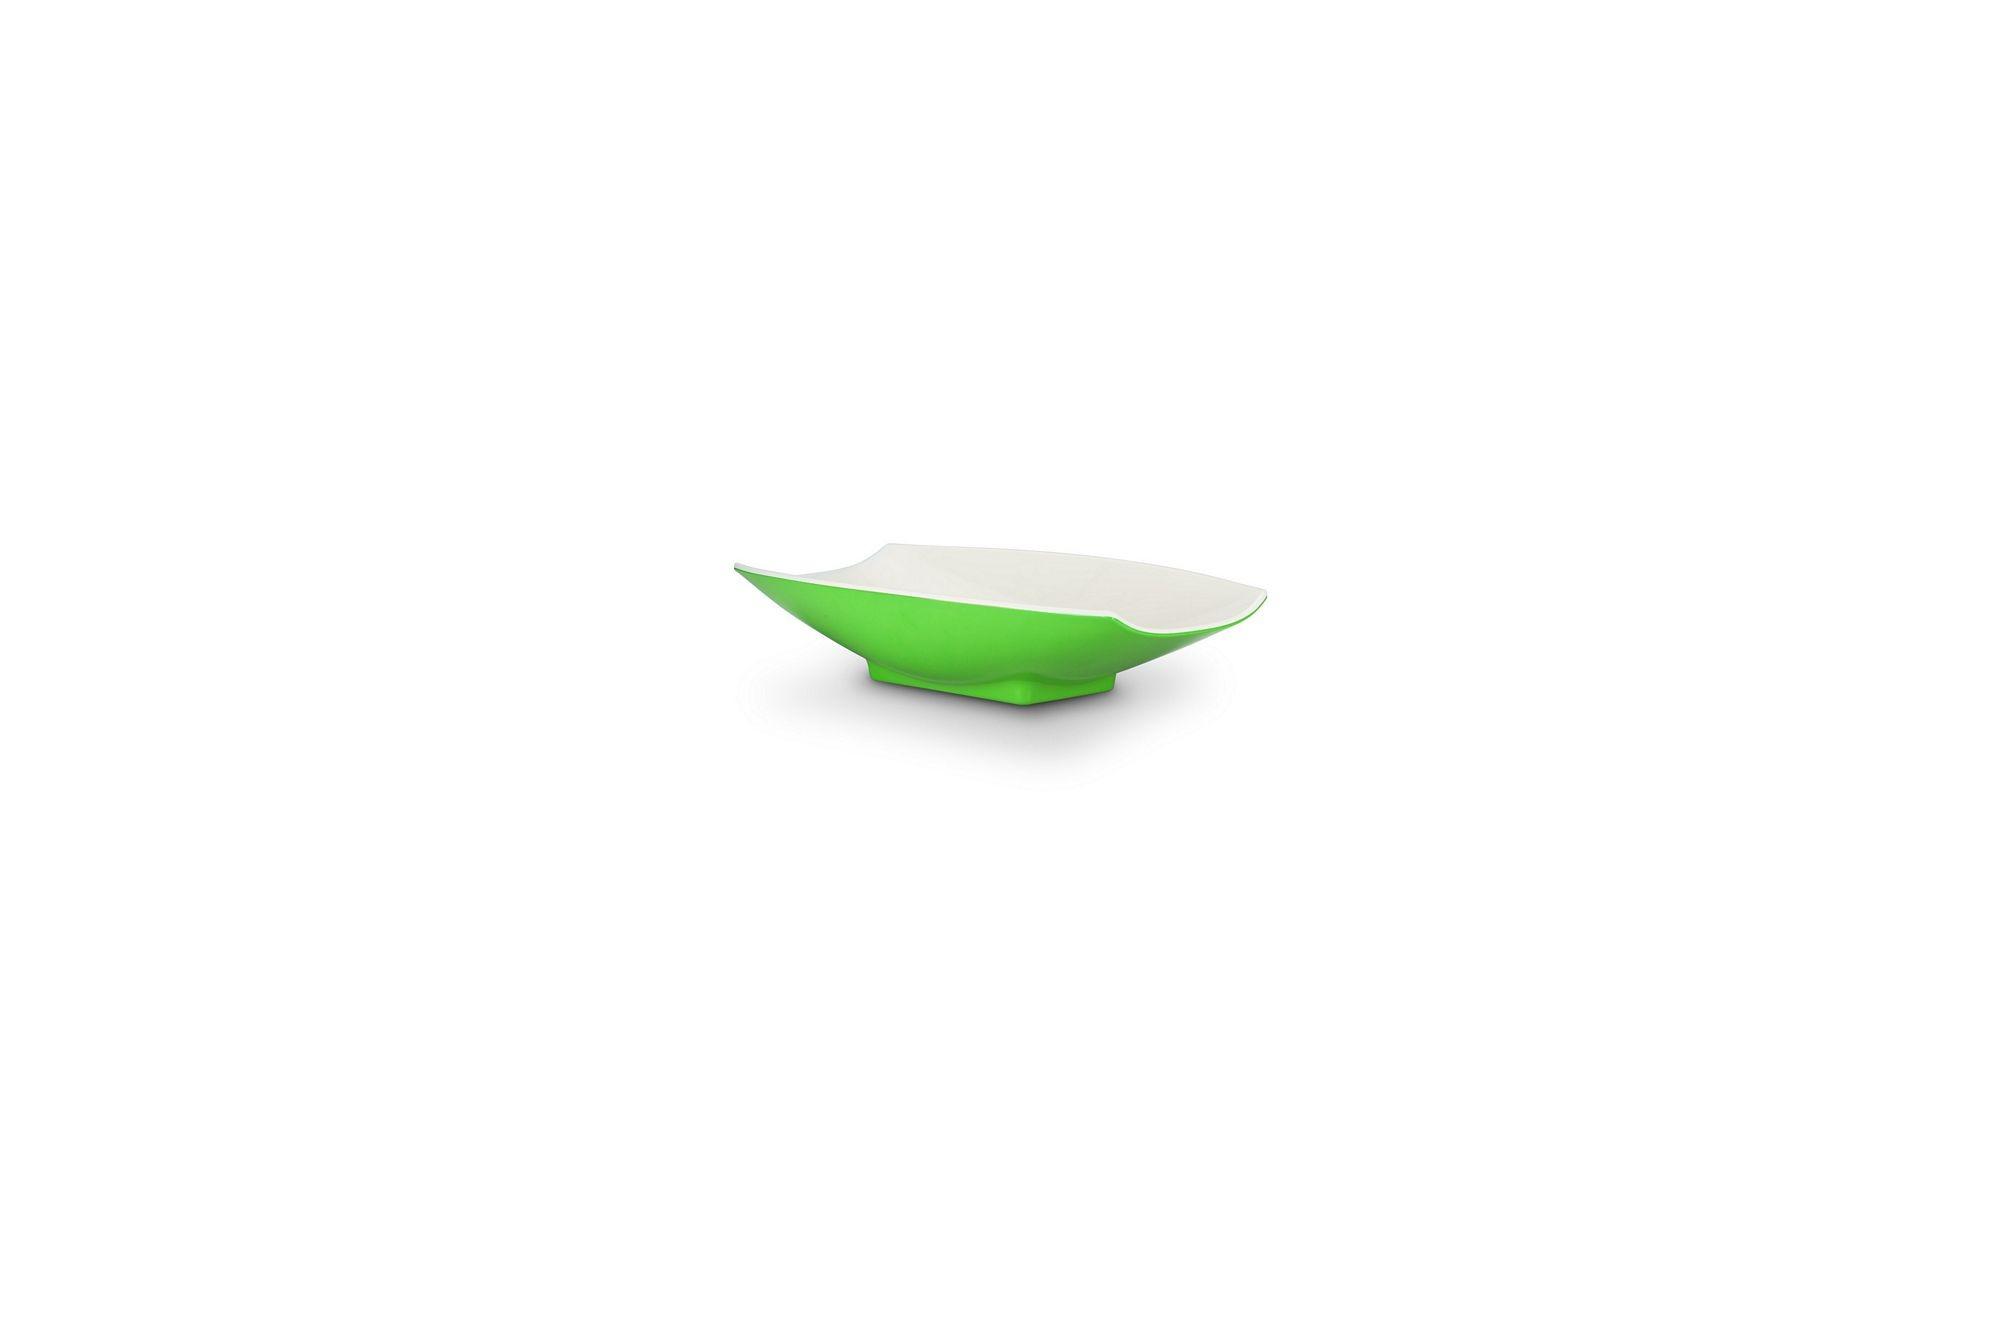 Bon Chef 53700-2ToneLime Melamine Curves Bowl, Lime Outside/White Inside 4 oz.